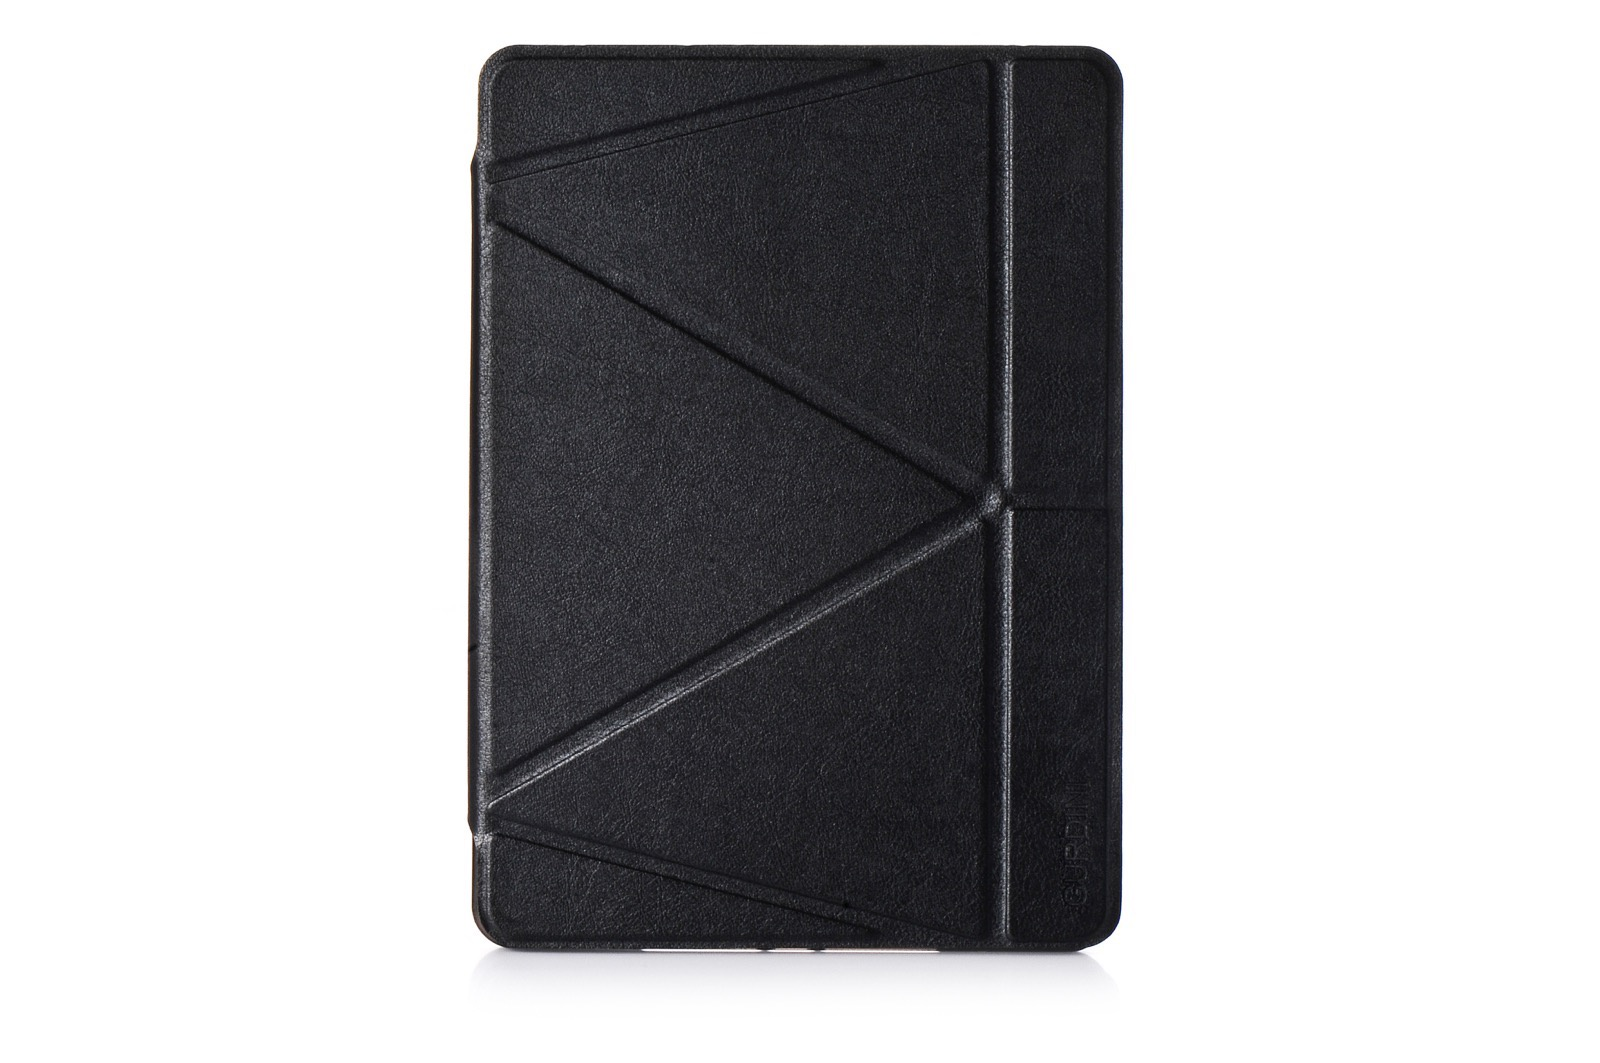 "Чехол для планшета Gurdini Lights Series 410340 для Apple Ipad mini 4 7.9"", 410340, черный"